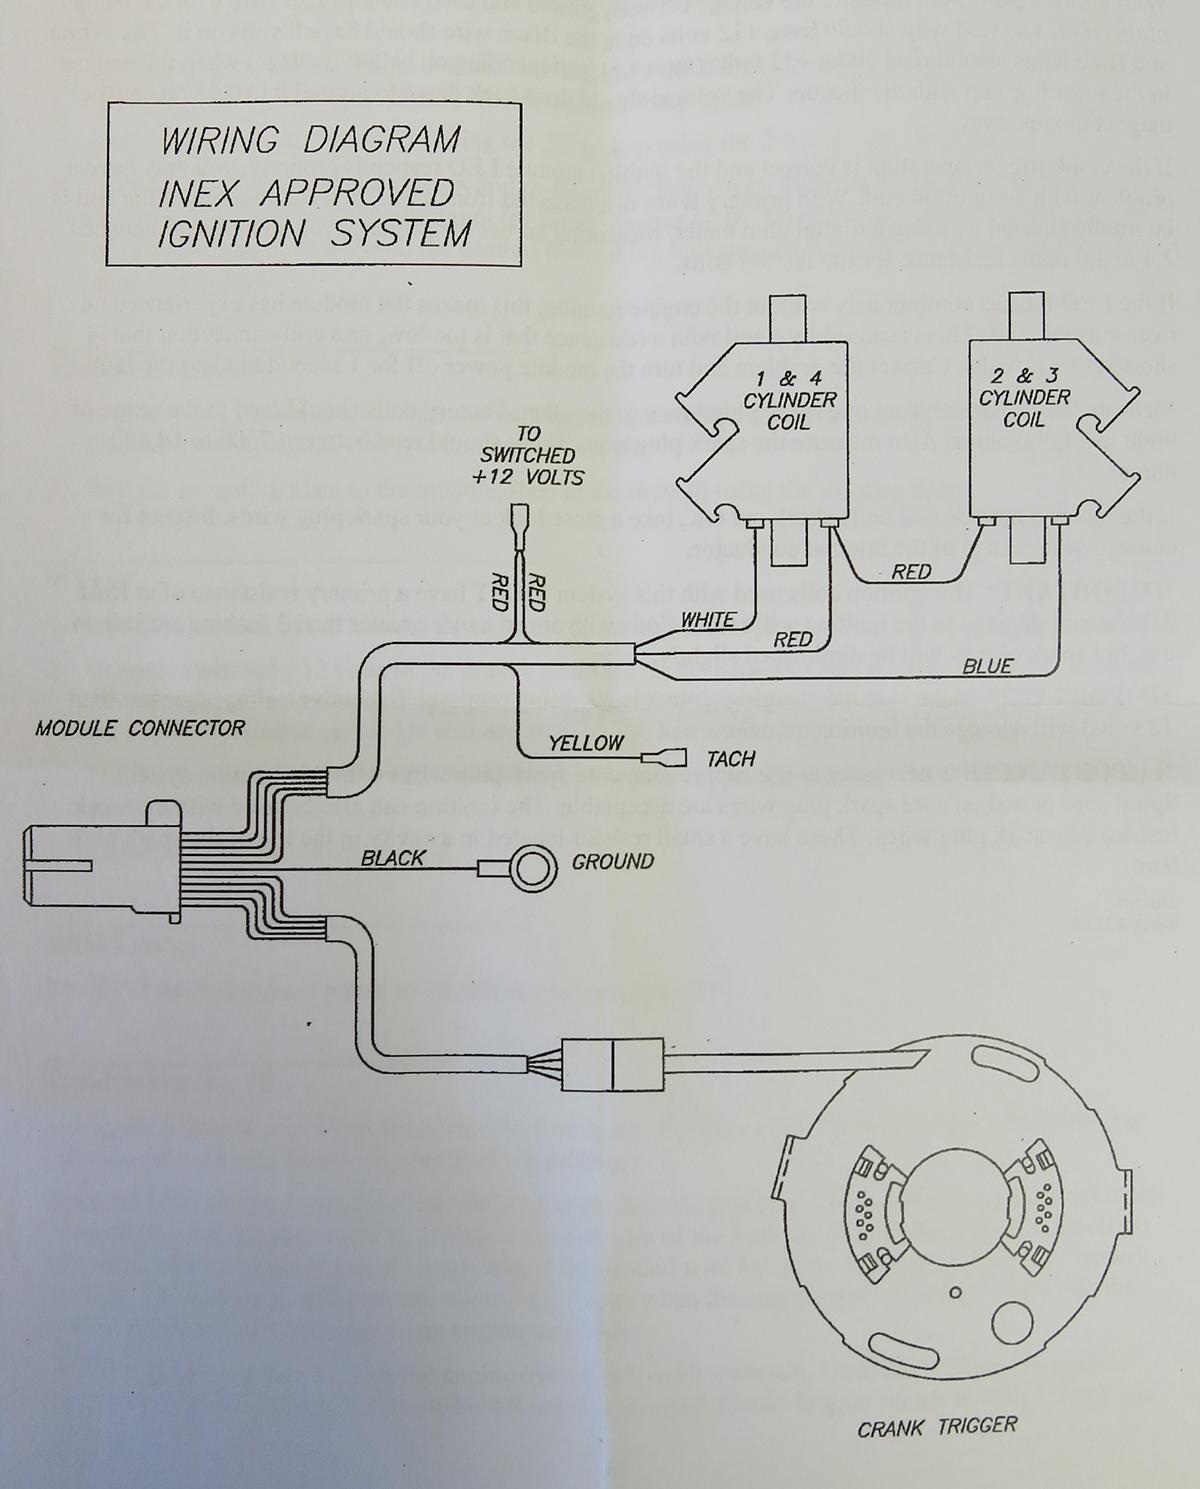 andrews motorsports technical information legend car wiring diagram [ 1200 x 1489 Pixel ]